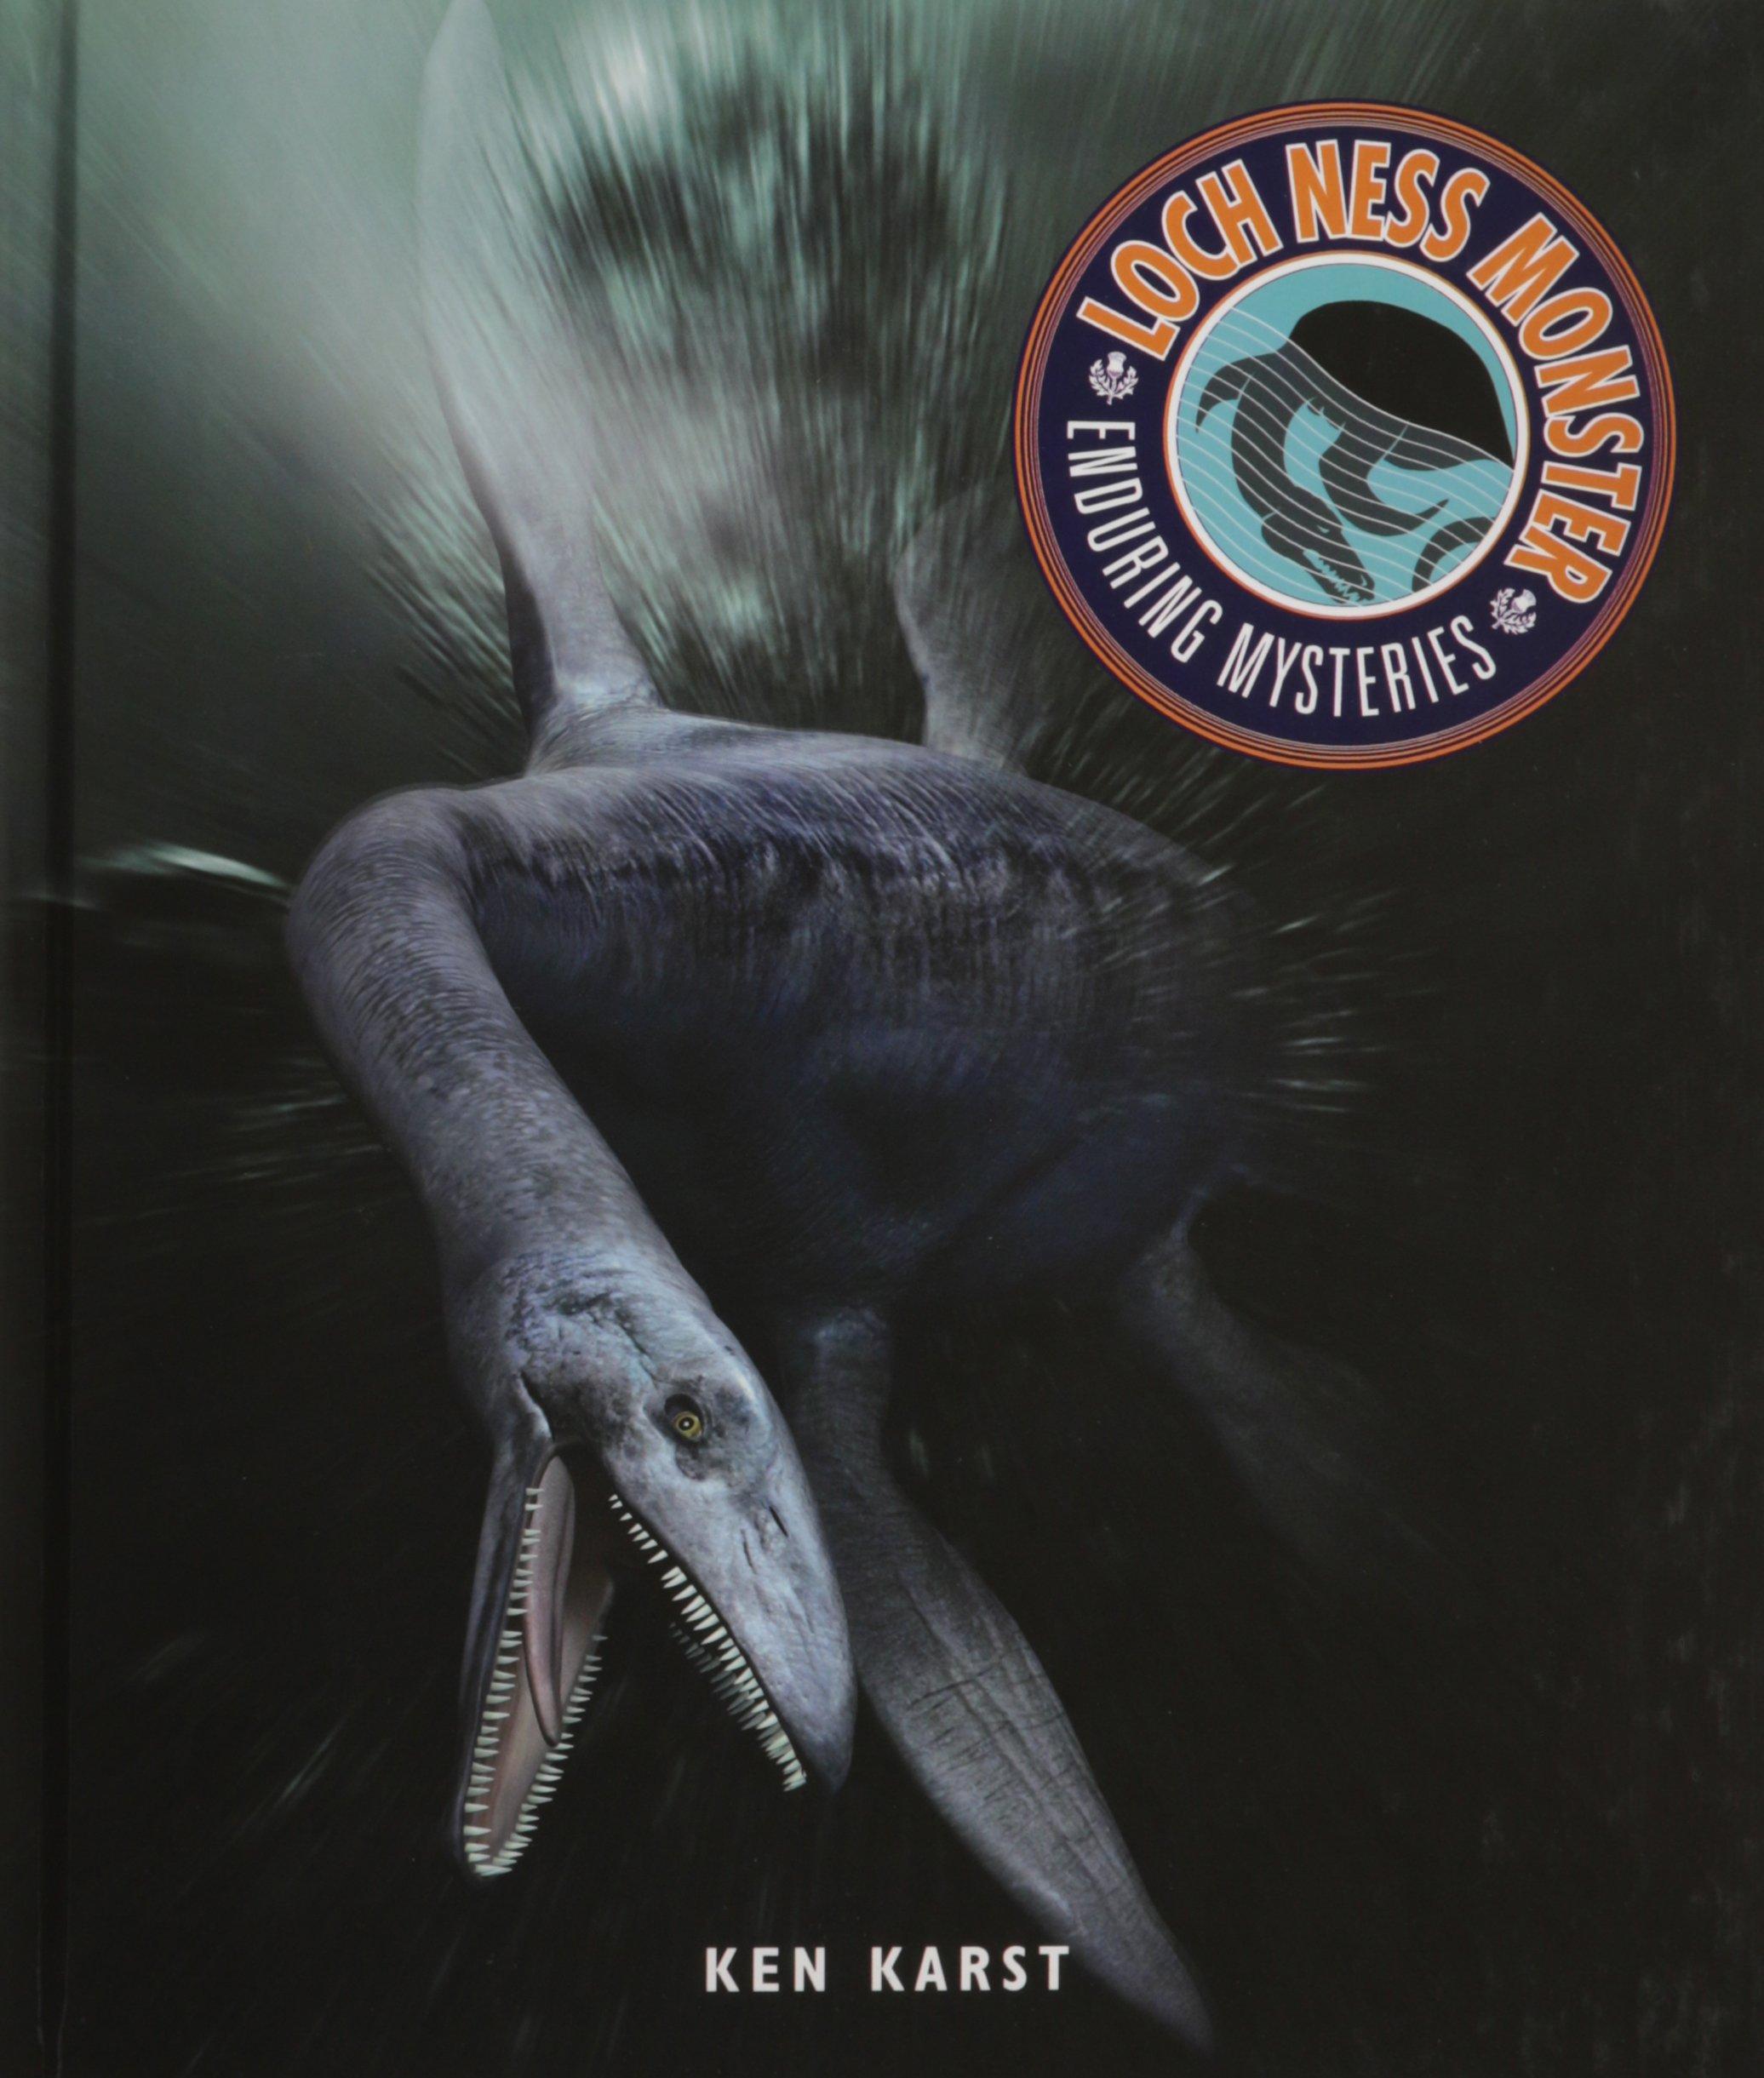 Loch Ness Monster (Enduring Mysteries) PDF